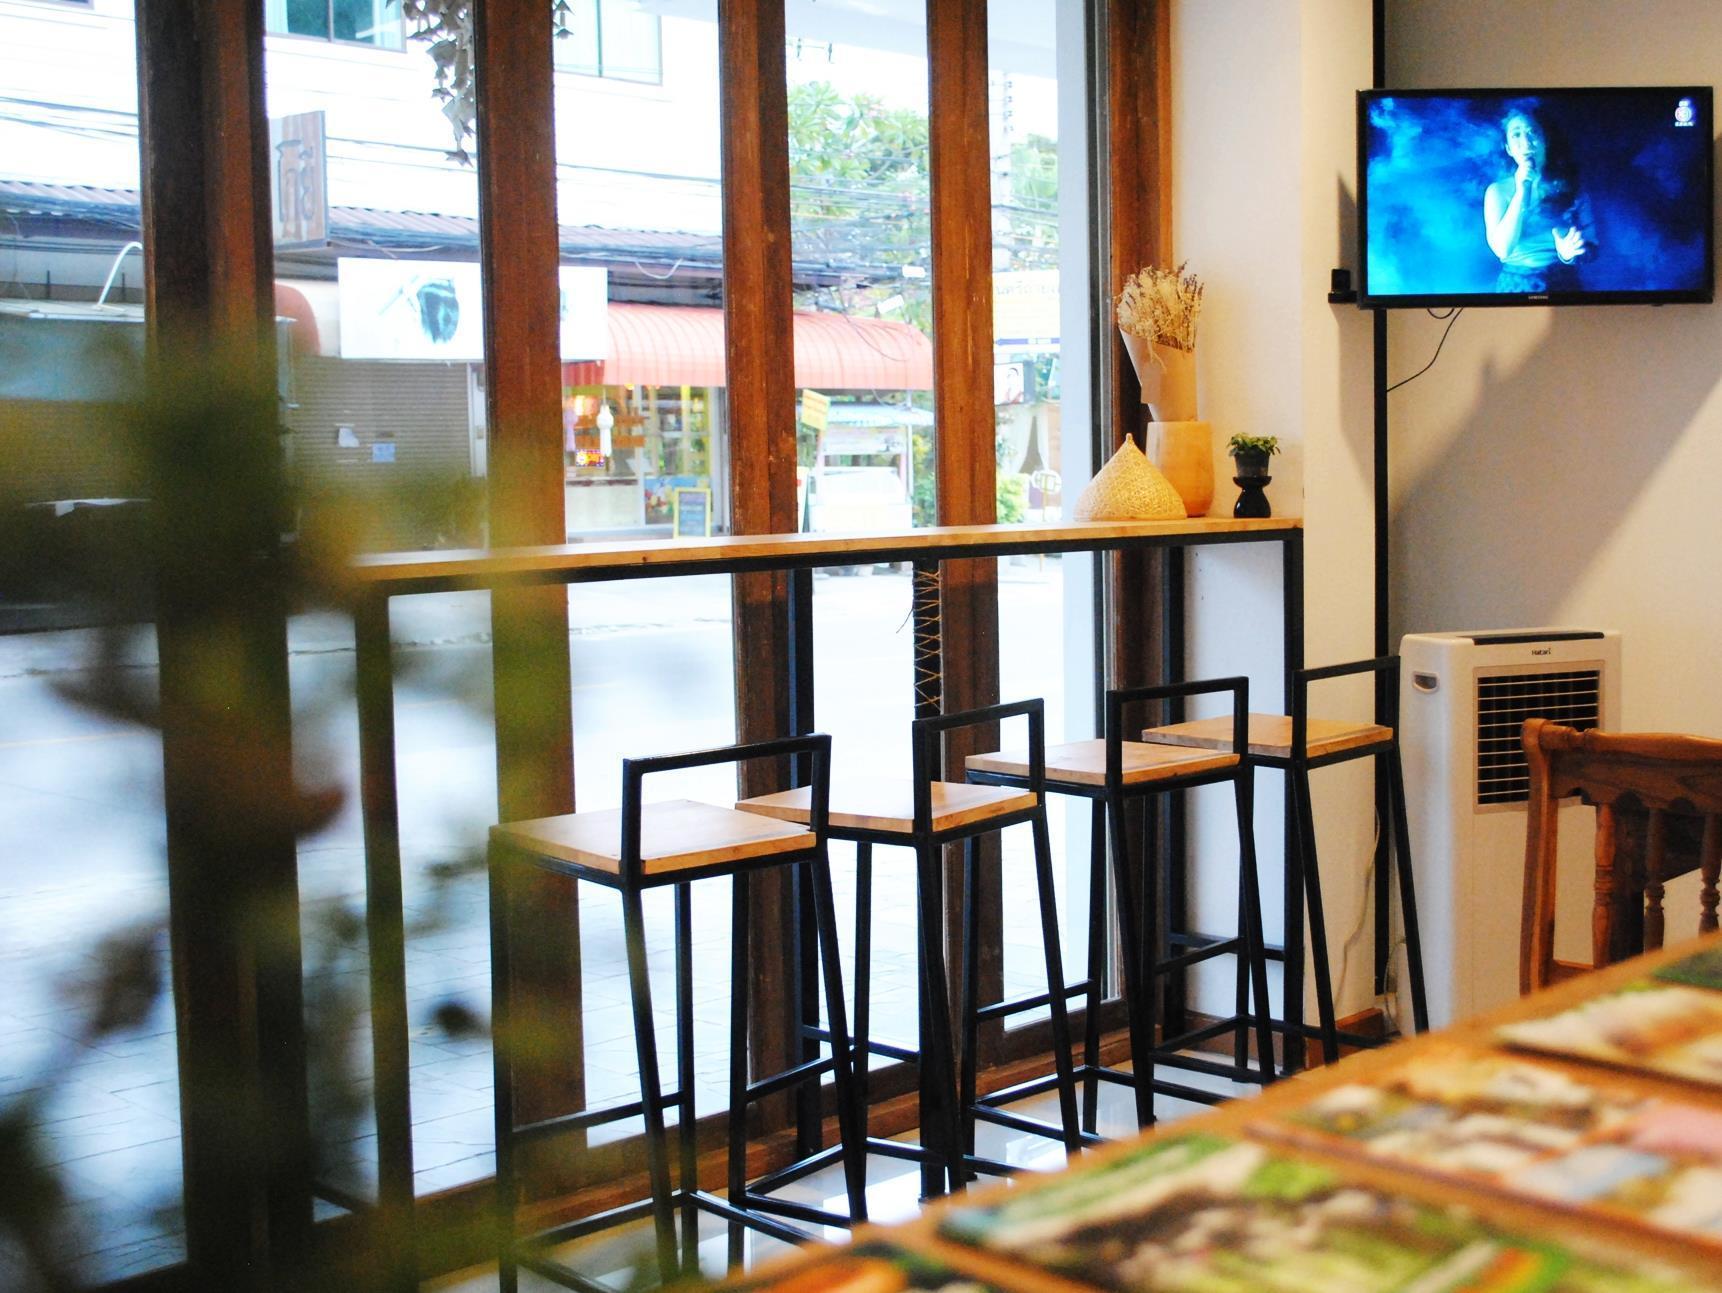 Rimnim Hostel Chiangmai ริมนิม โฮสเทล เชียงใหม่